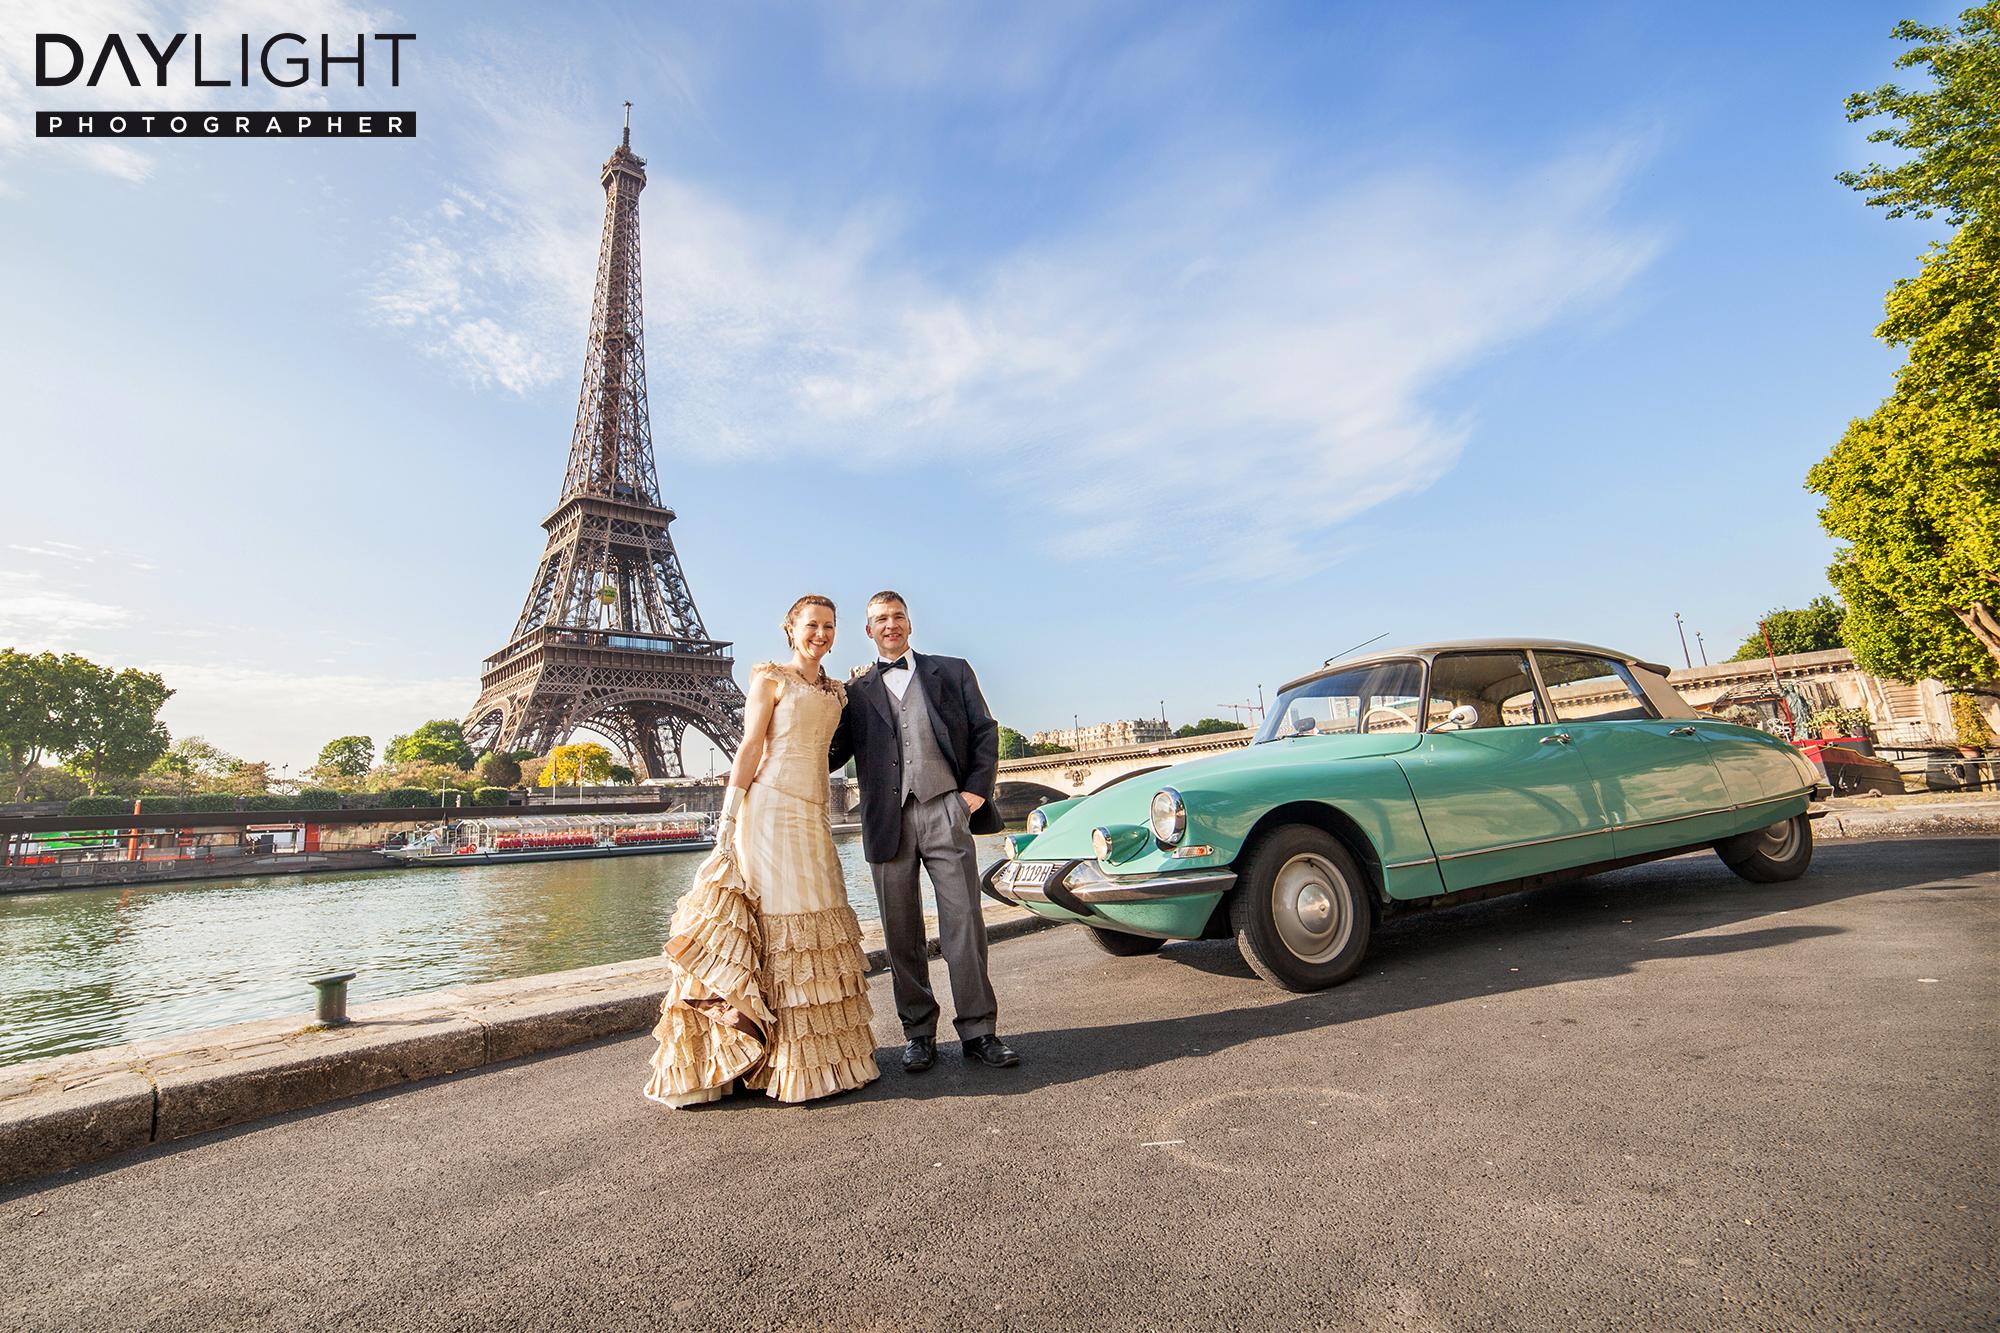 fotograf paris booking